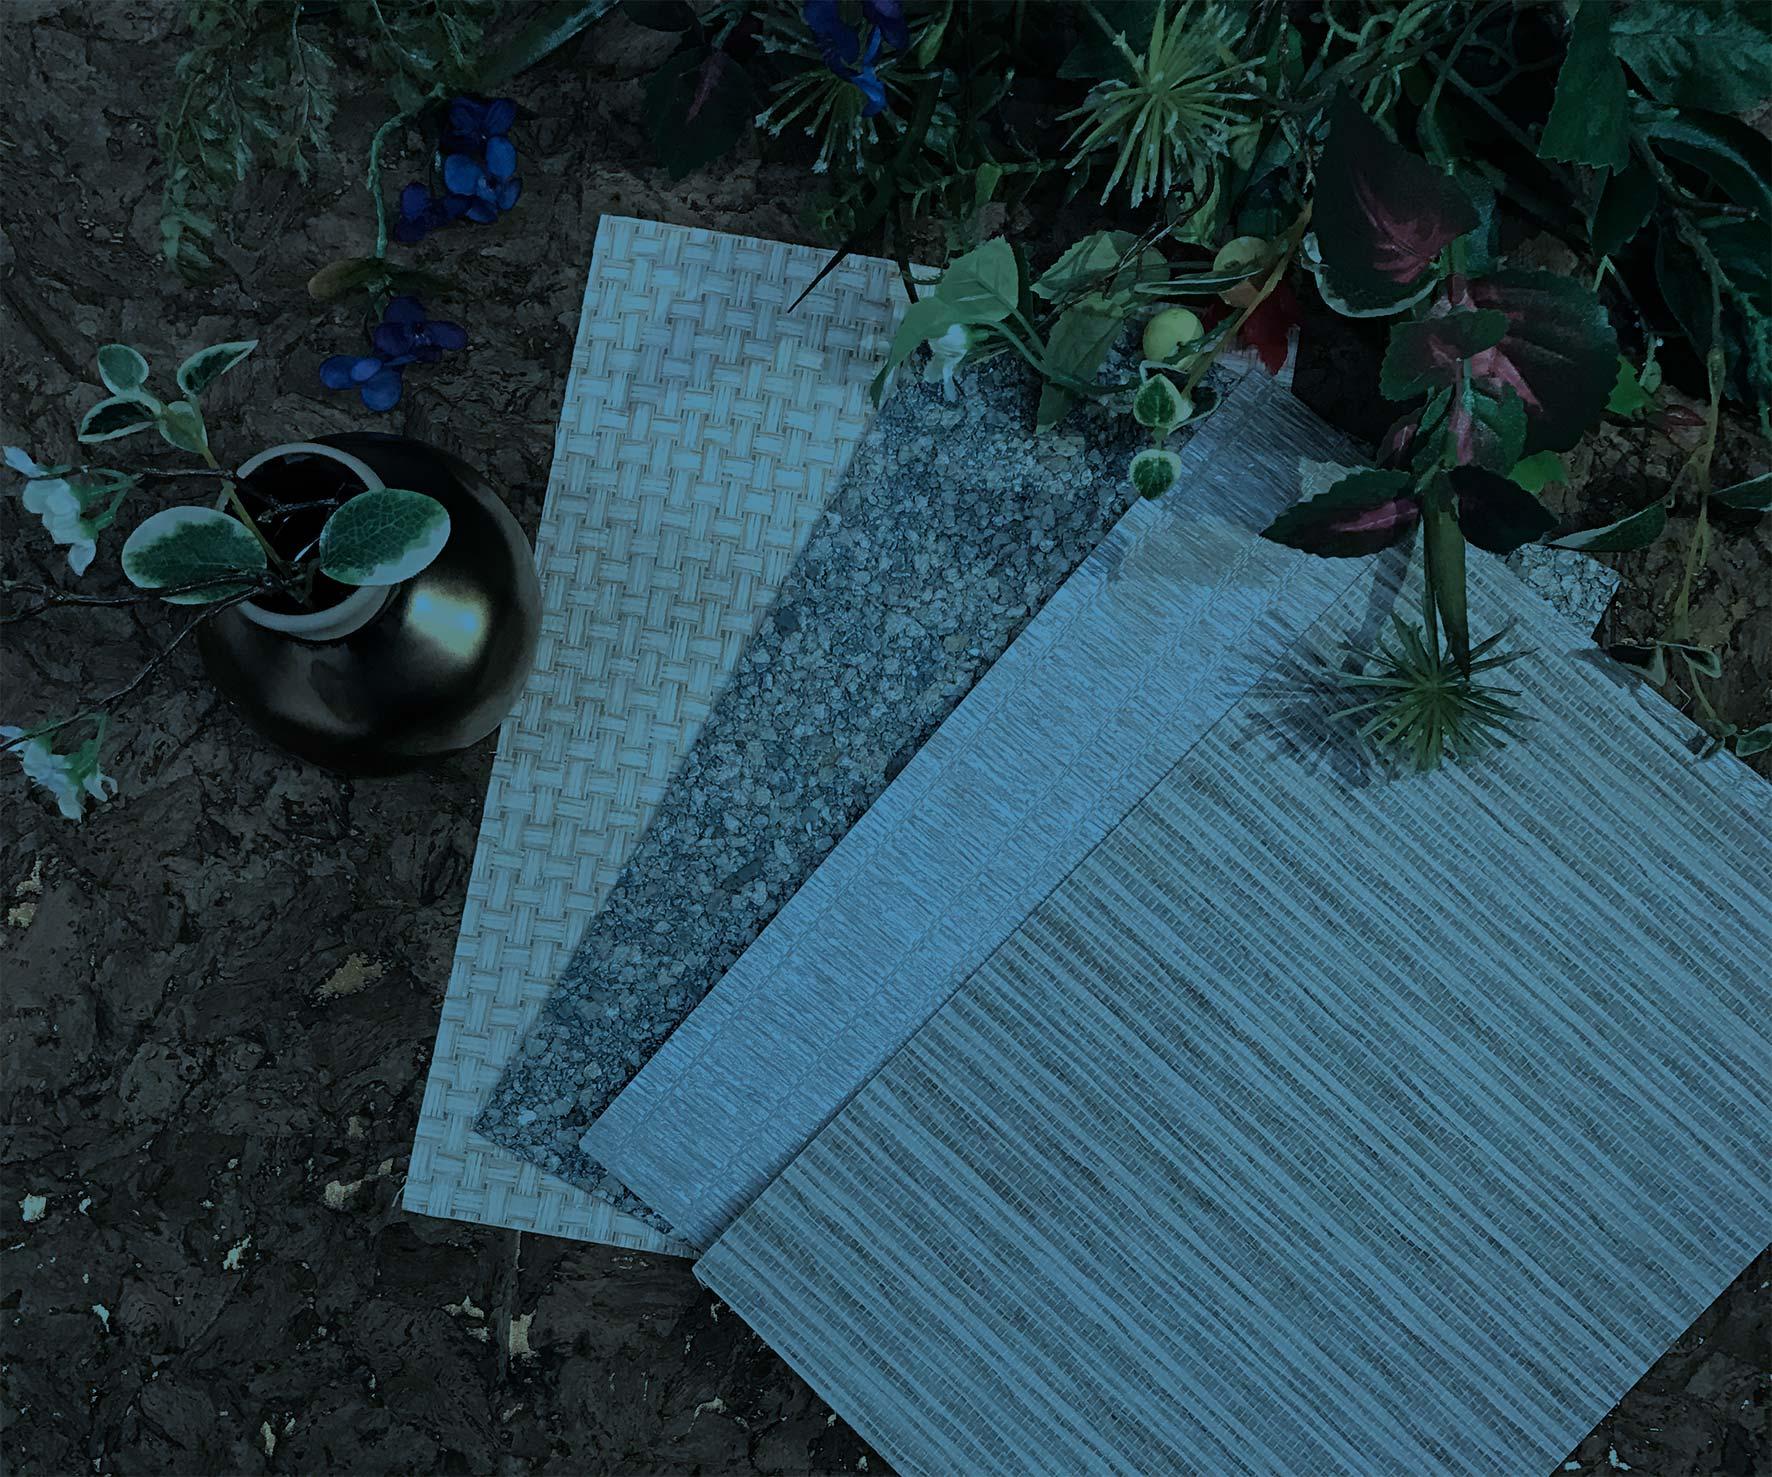 Shênzhèn - Grasscloths, Paperweaves, Textiles, Micas & Corks